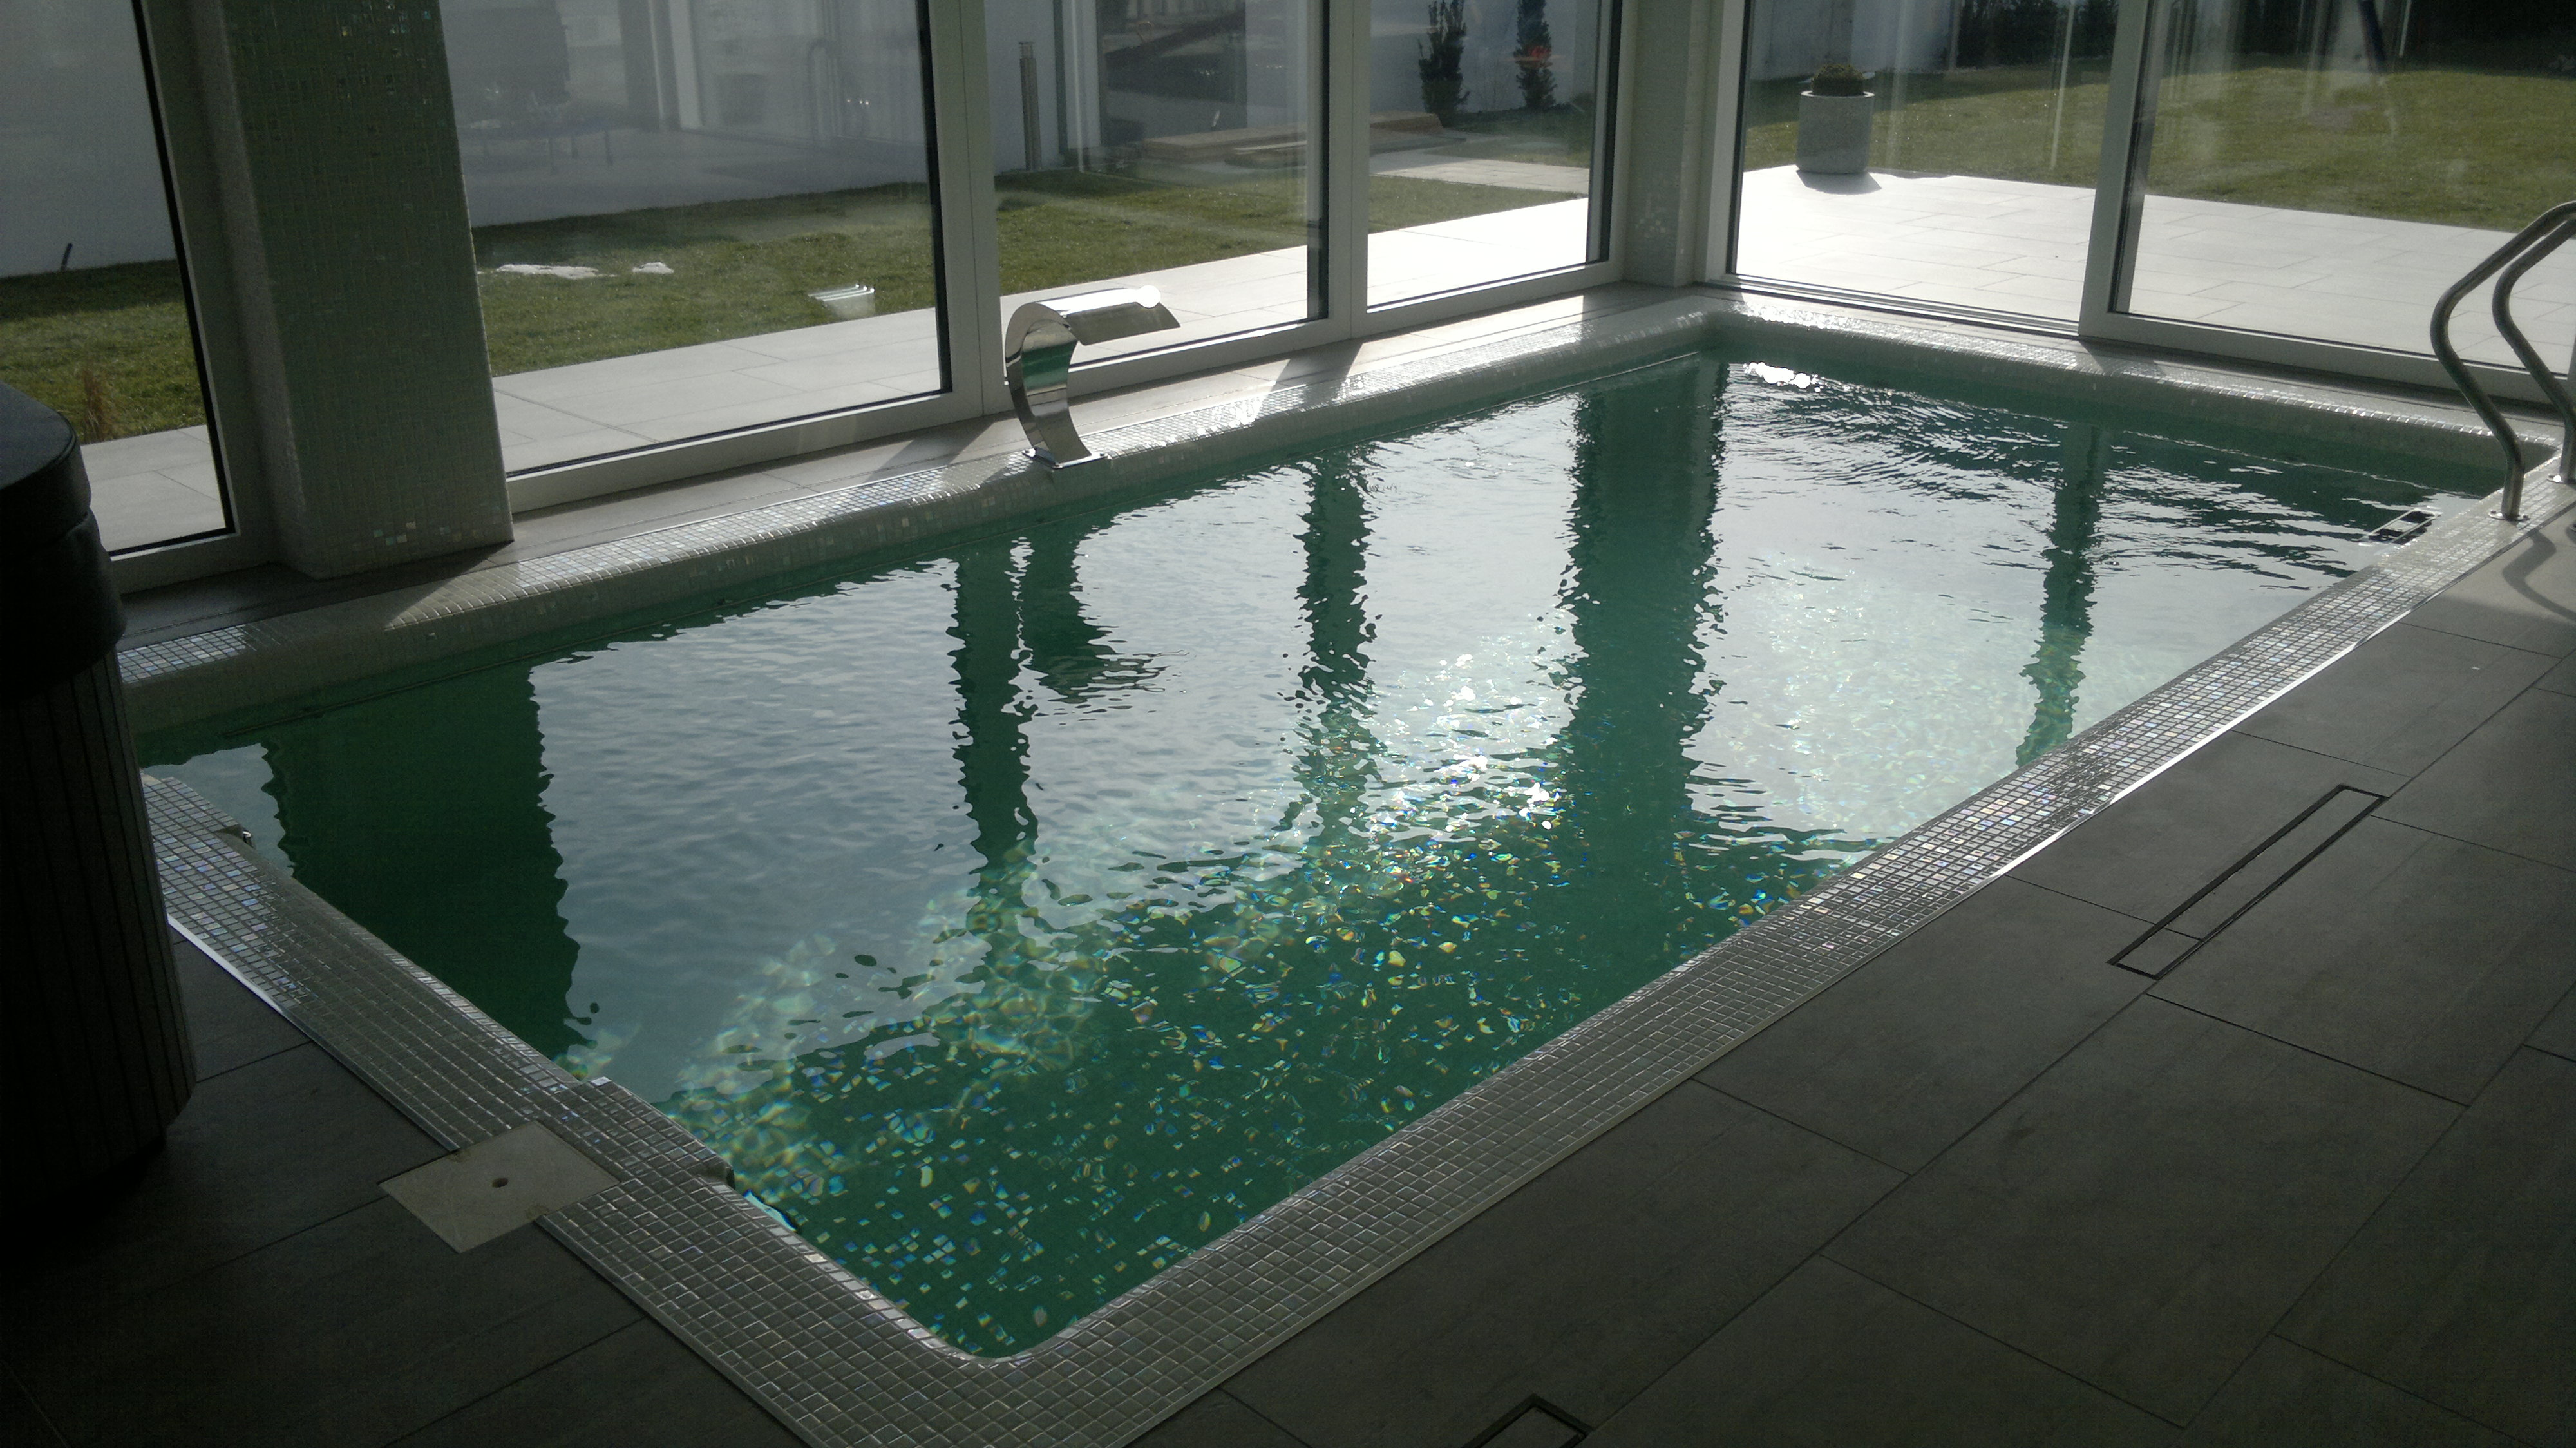 Dehumidification for indoor pools